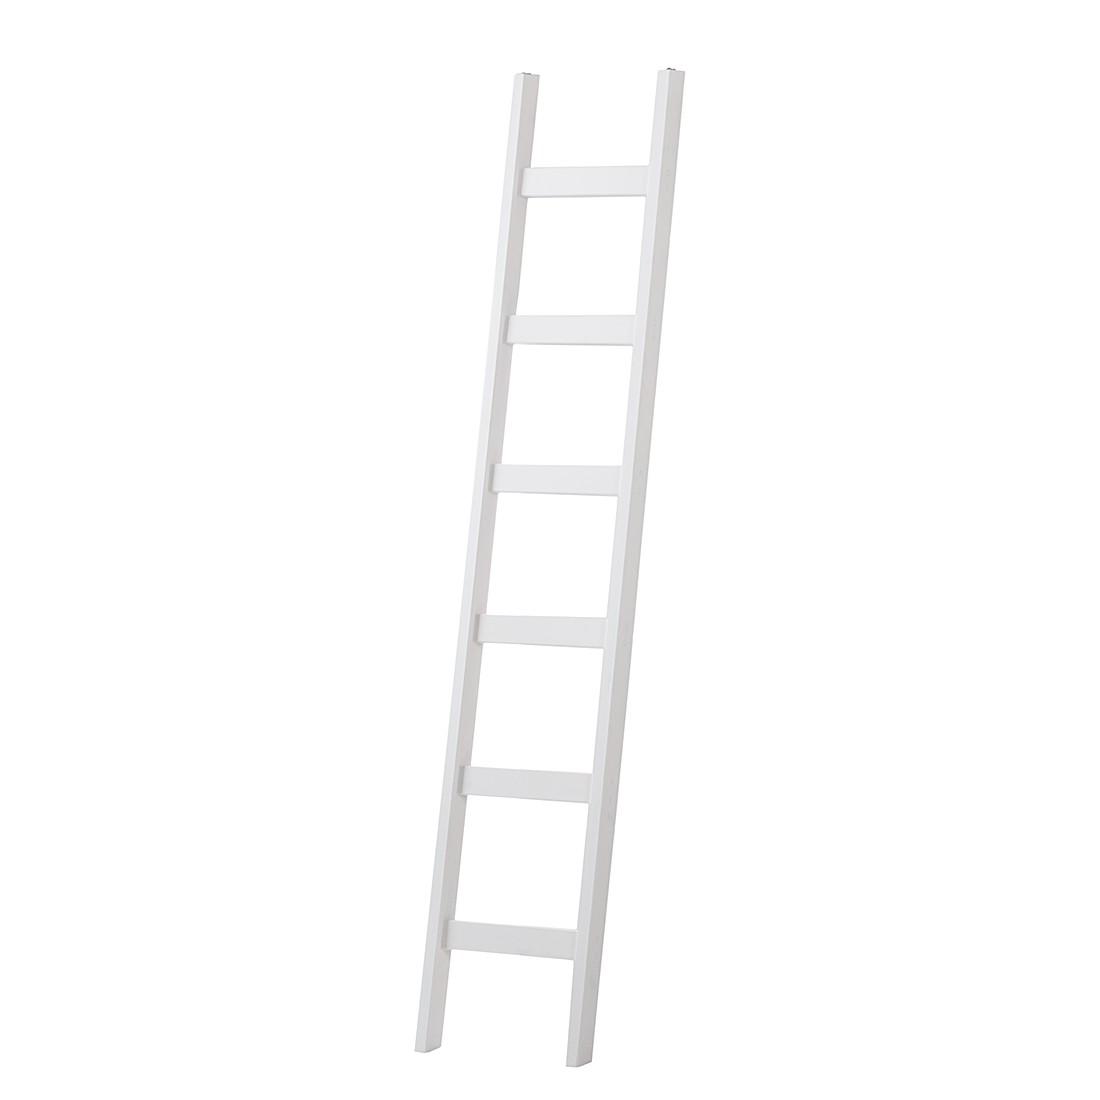 Ladder Lillehammer massief grenenhout wit, Lars Larson